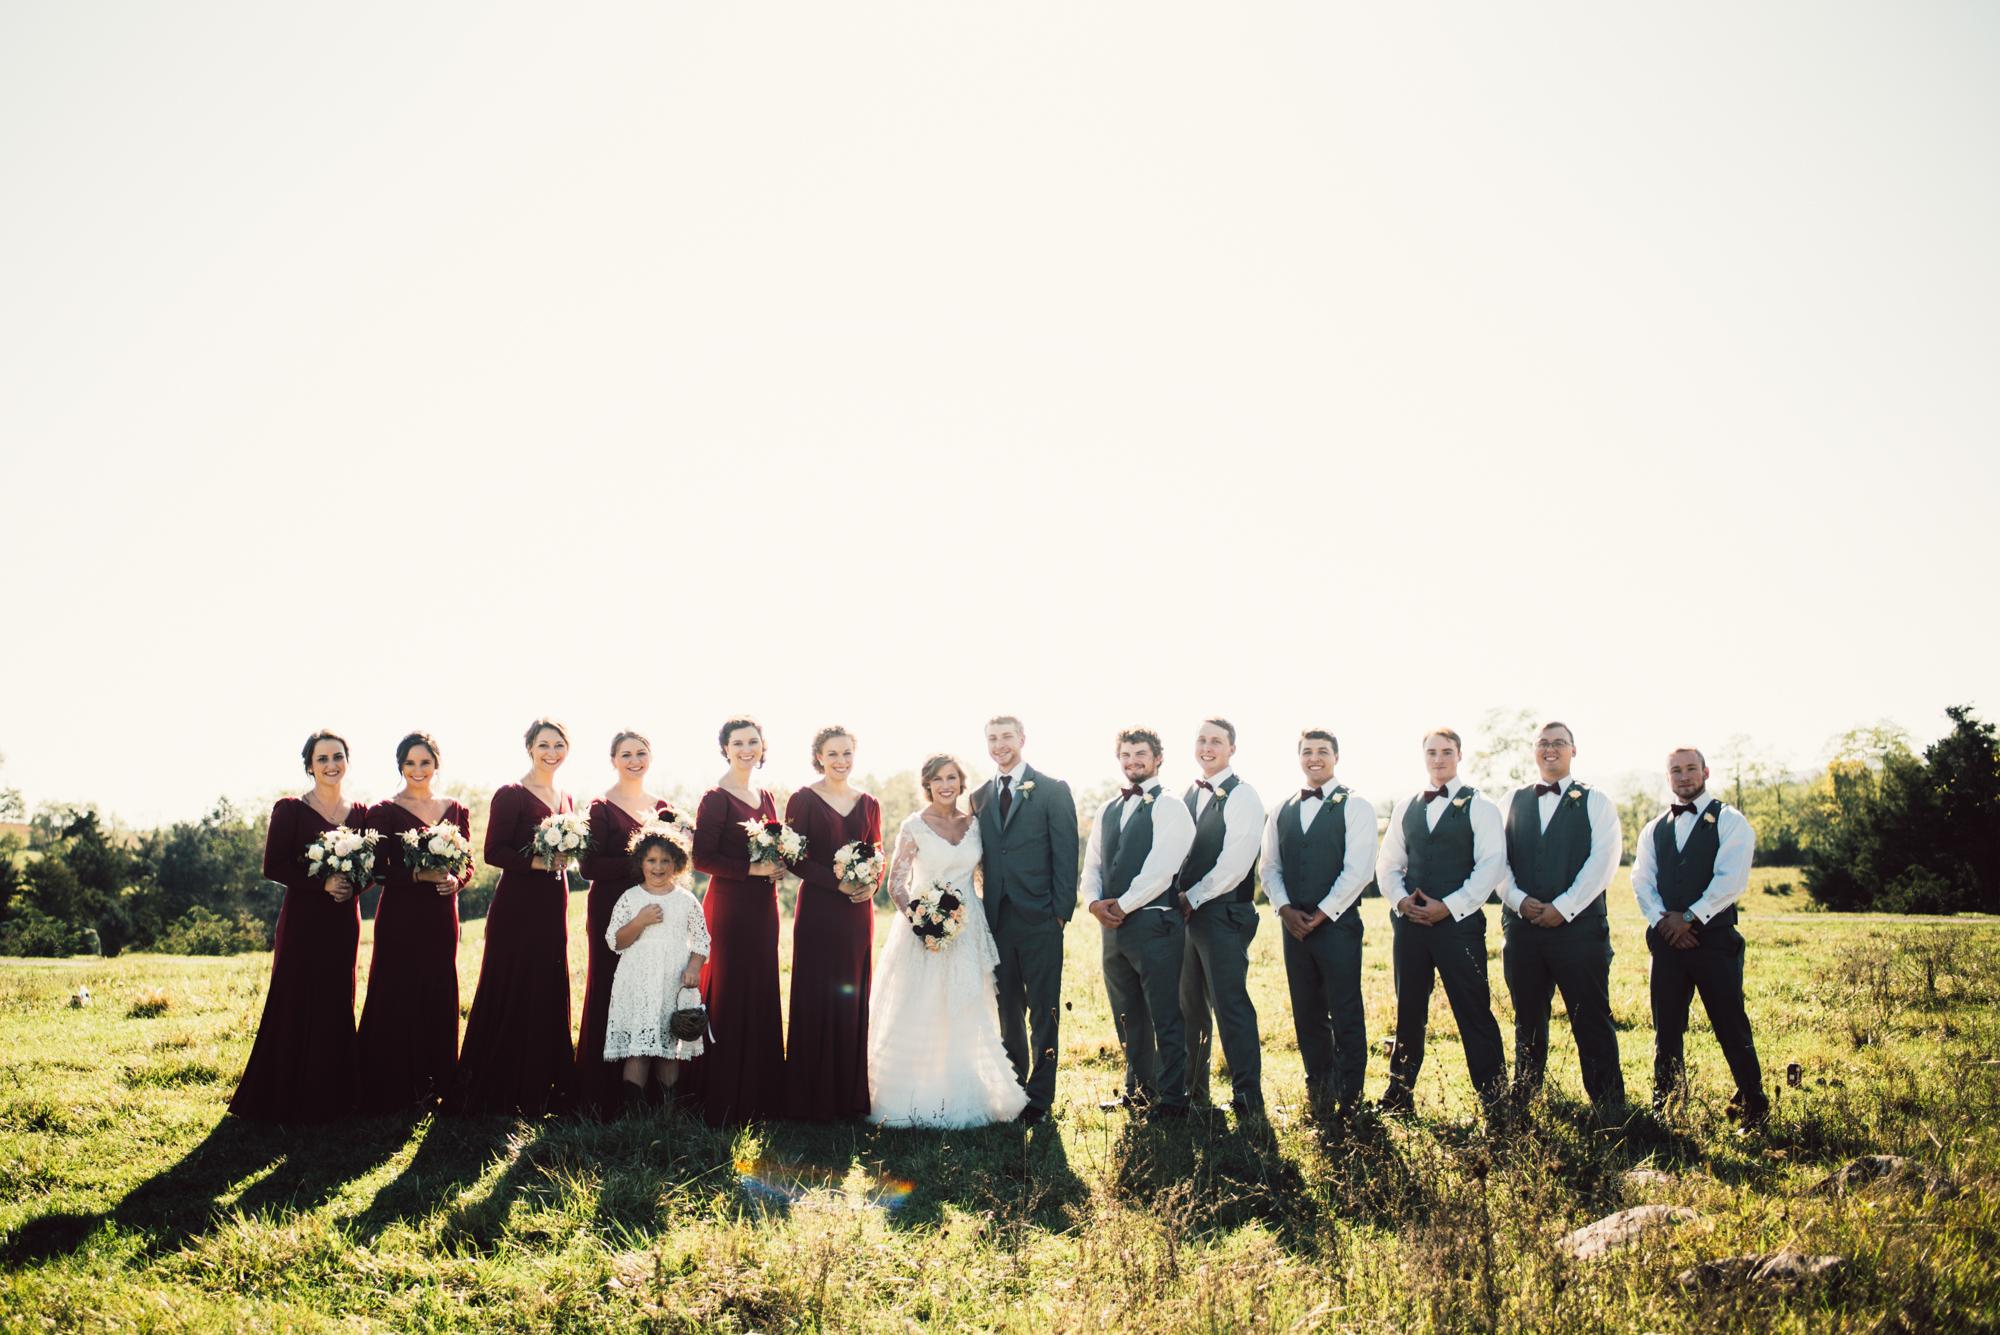 Ashley-and-Michael-Beaune-Woodstock-Virginia-Wedding-Shenandoah-Valley_24.JPG